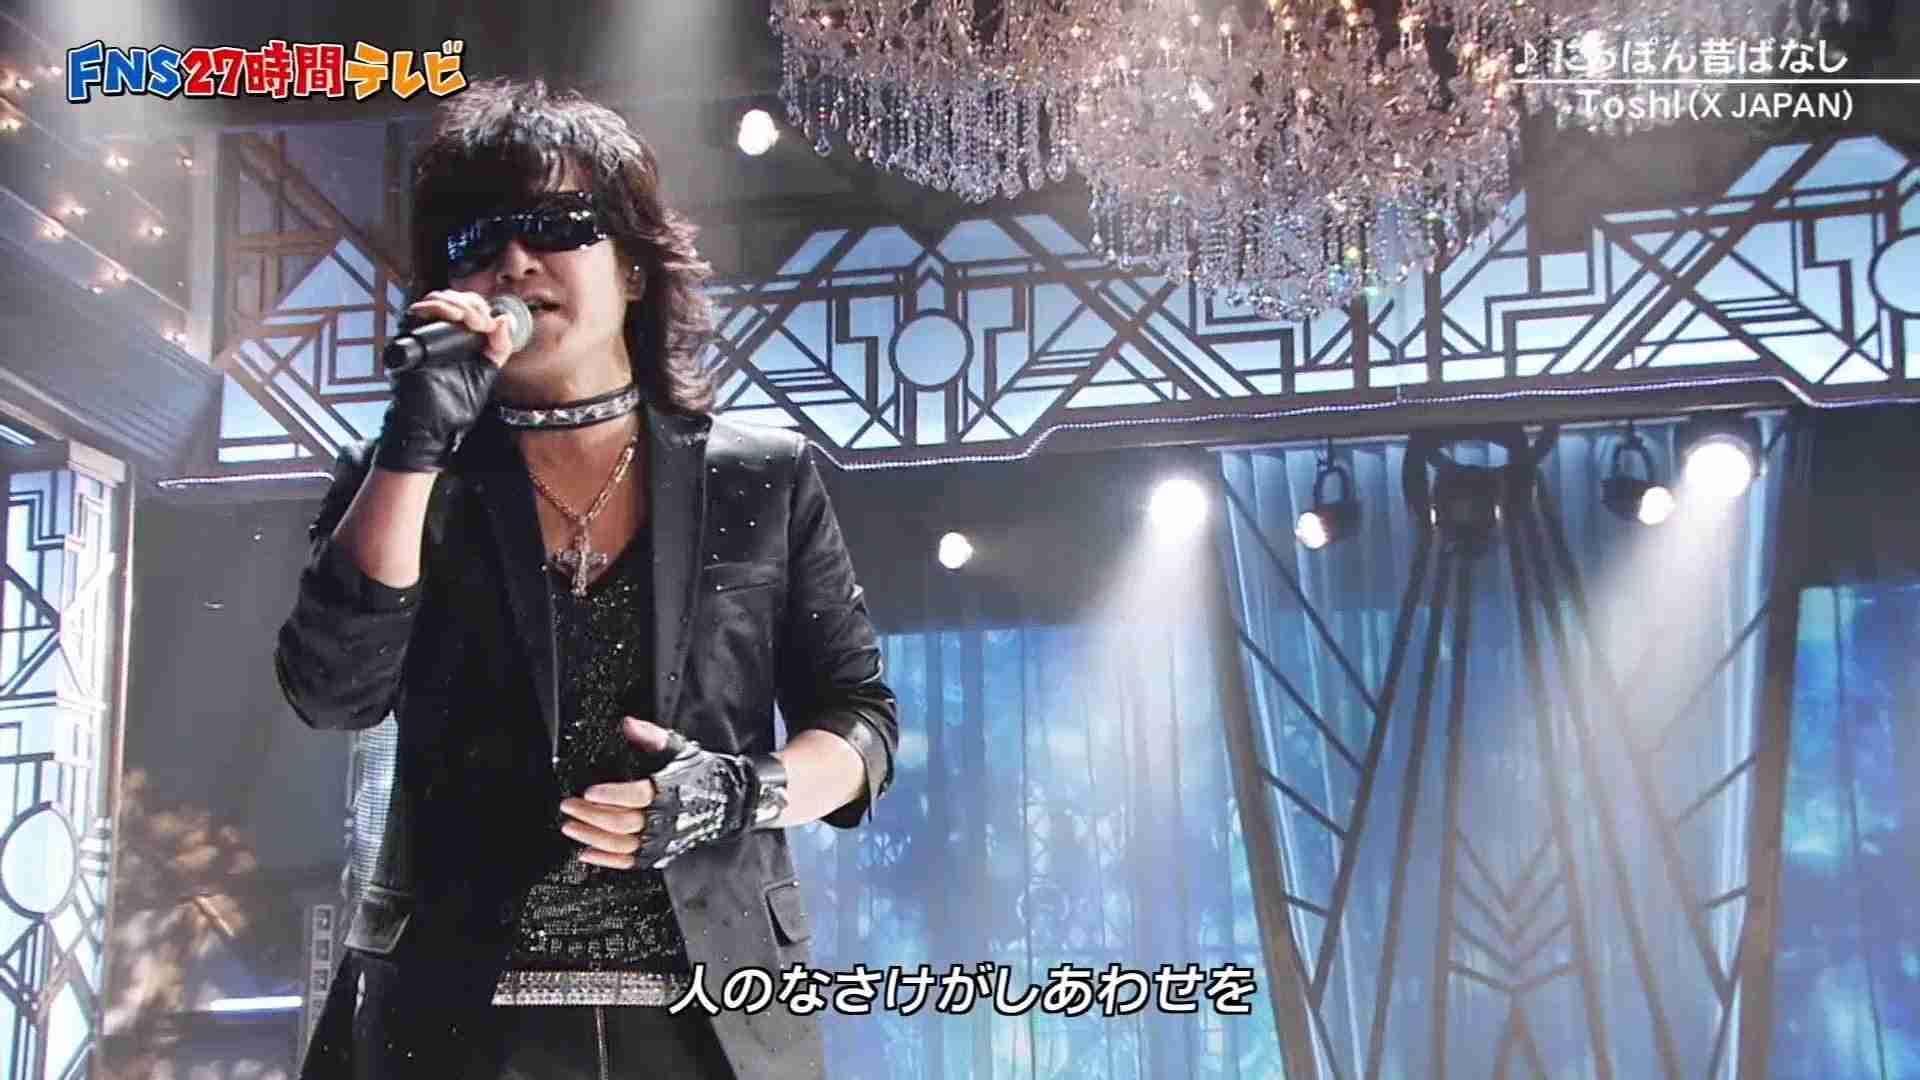 ToshI 日本昔話 27時間テレビ 20150726 - YouTube